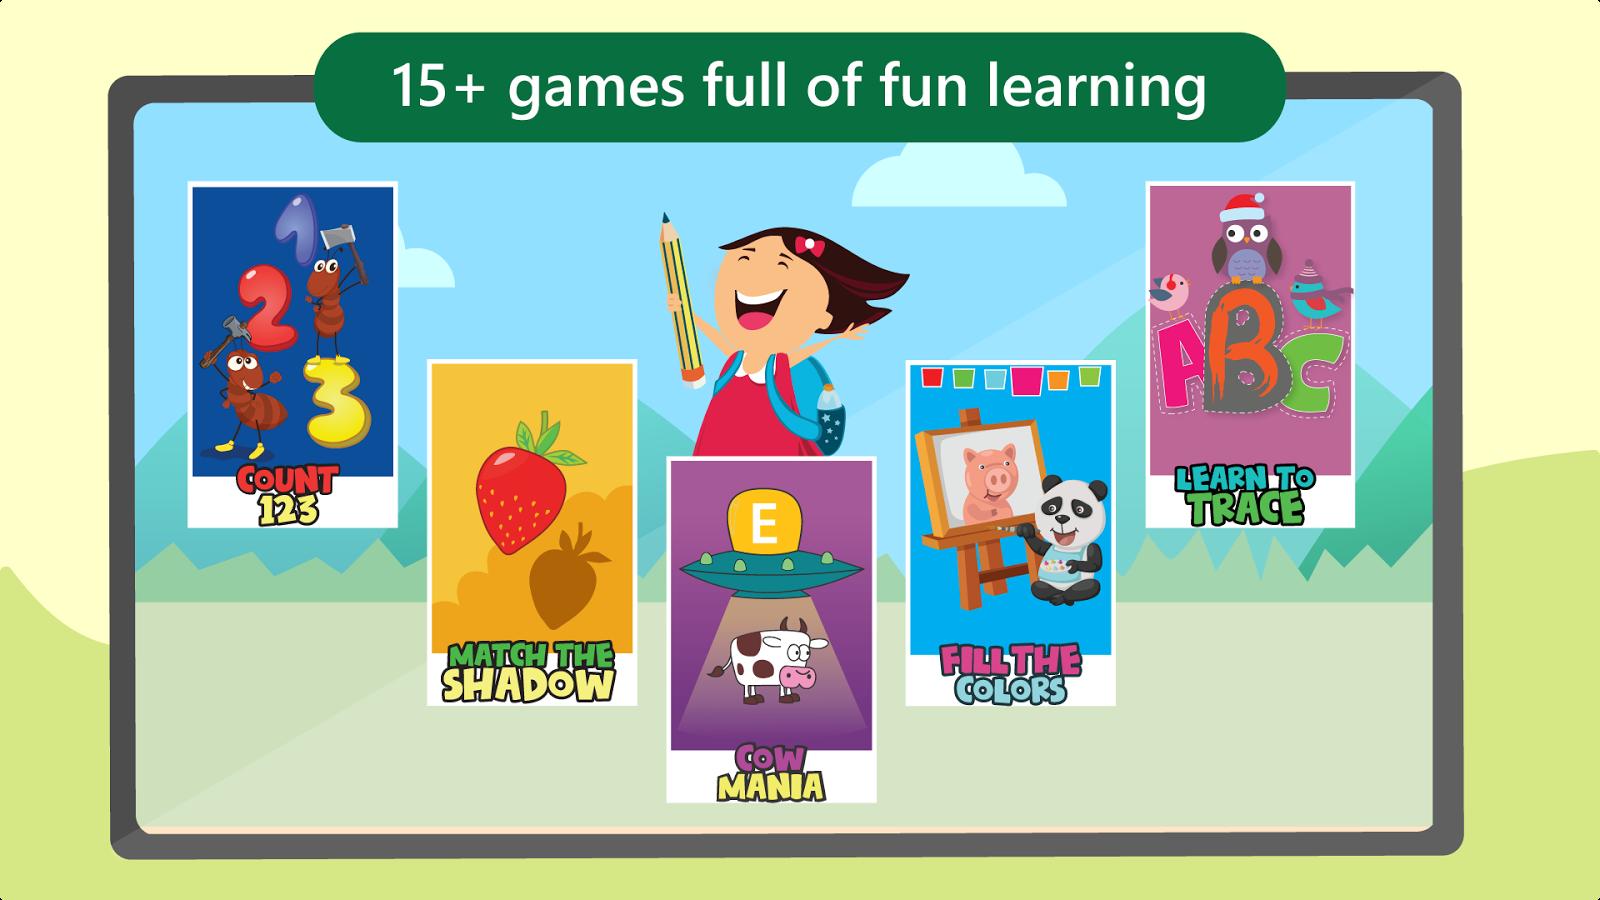 Co color by number games kids - Preschool Learning Games Kids Screenshot